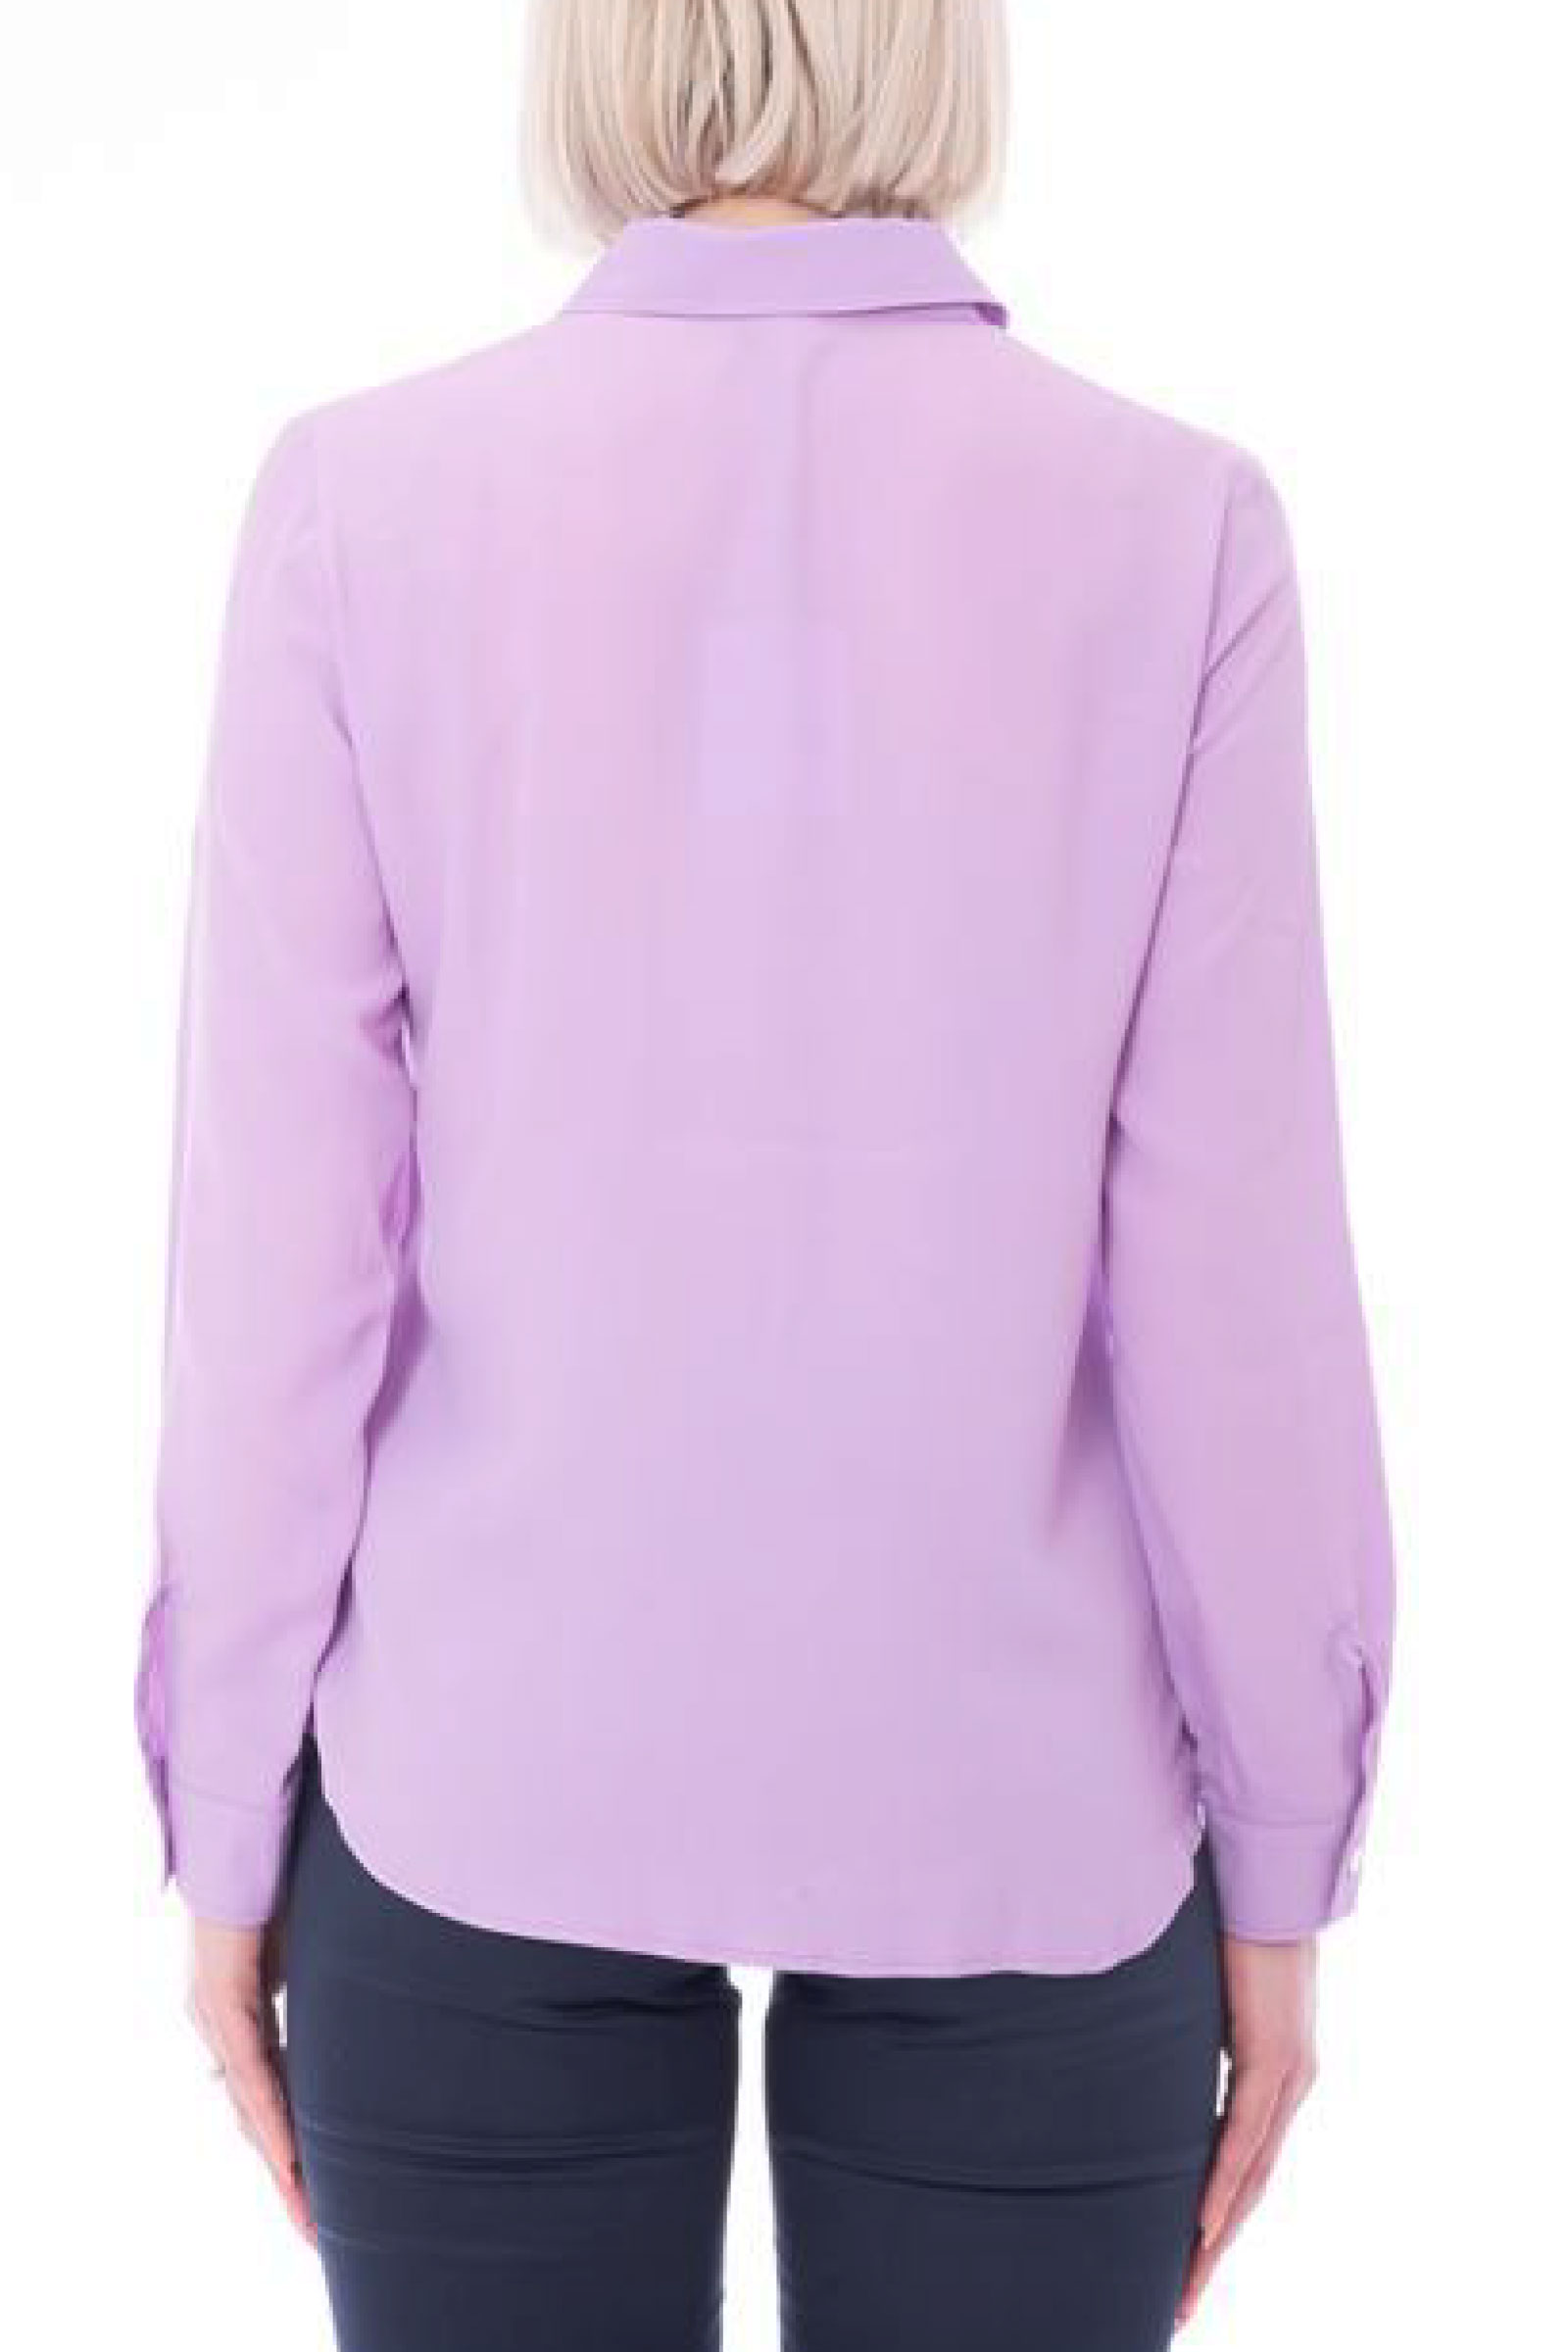 EMME MARELLA | Shirt | 51111715000004